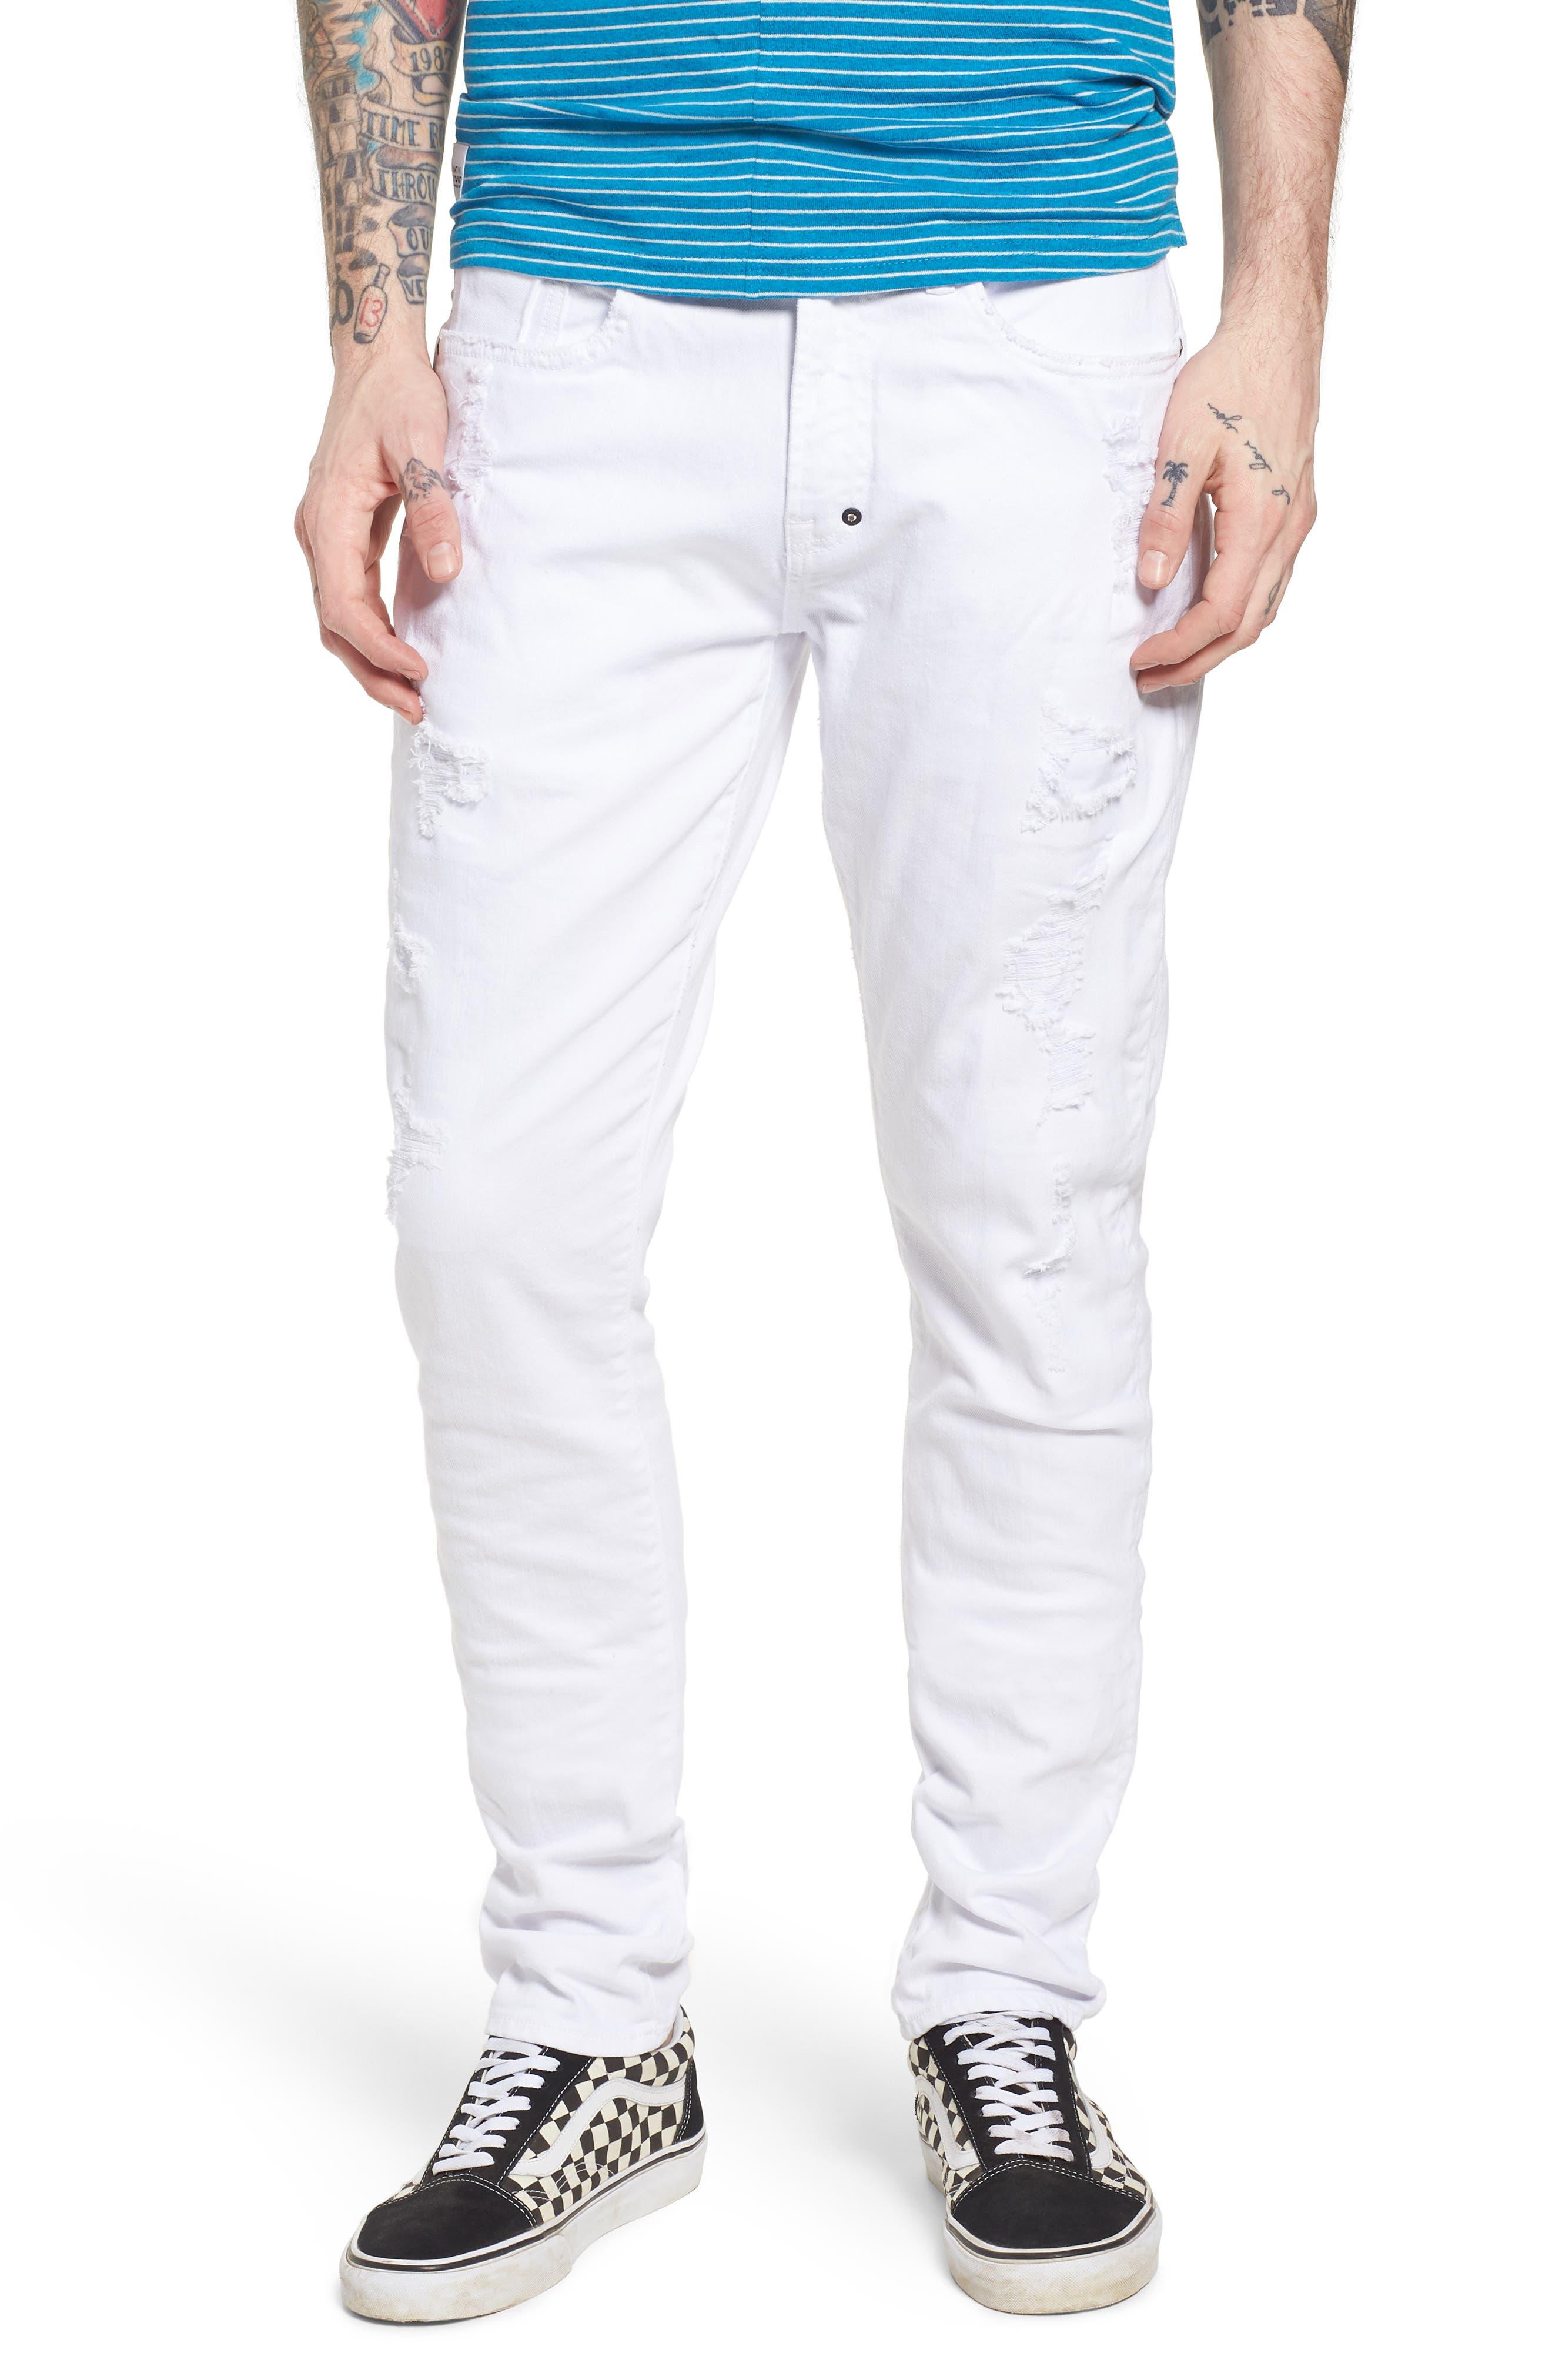 Windsor Slim Fit Jeans,                             Main thumbnail 1, color,                             Living White